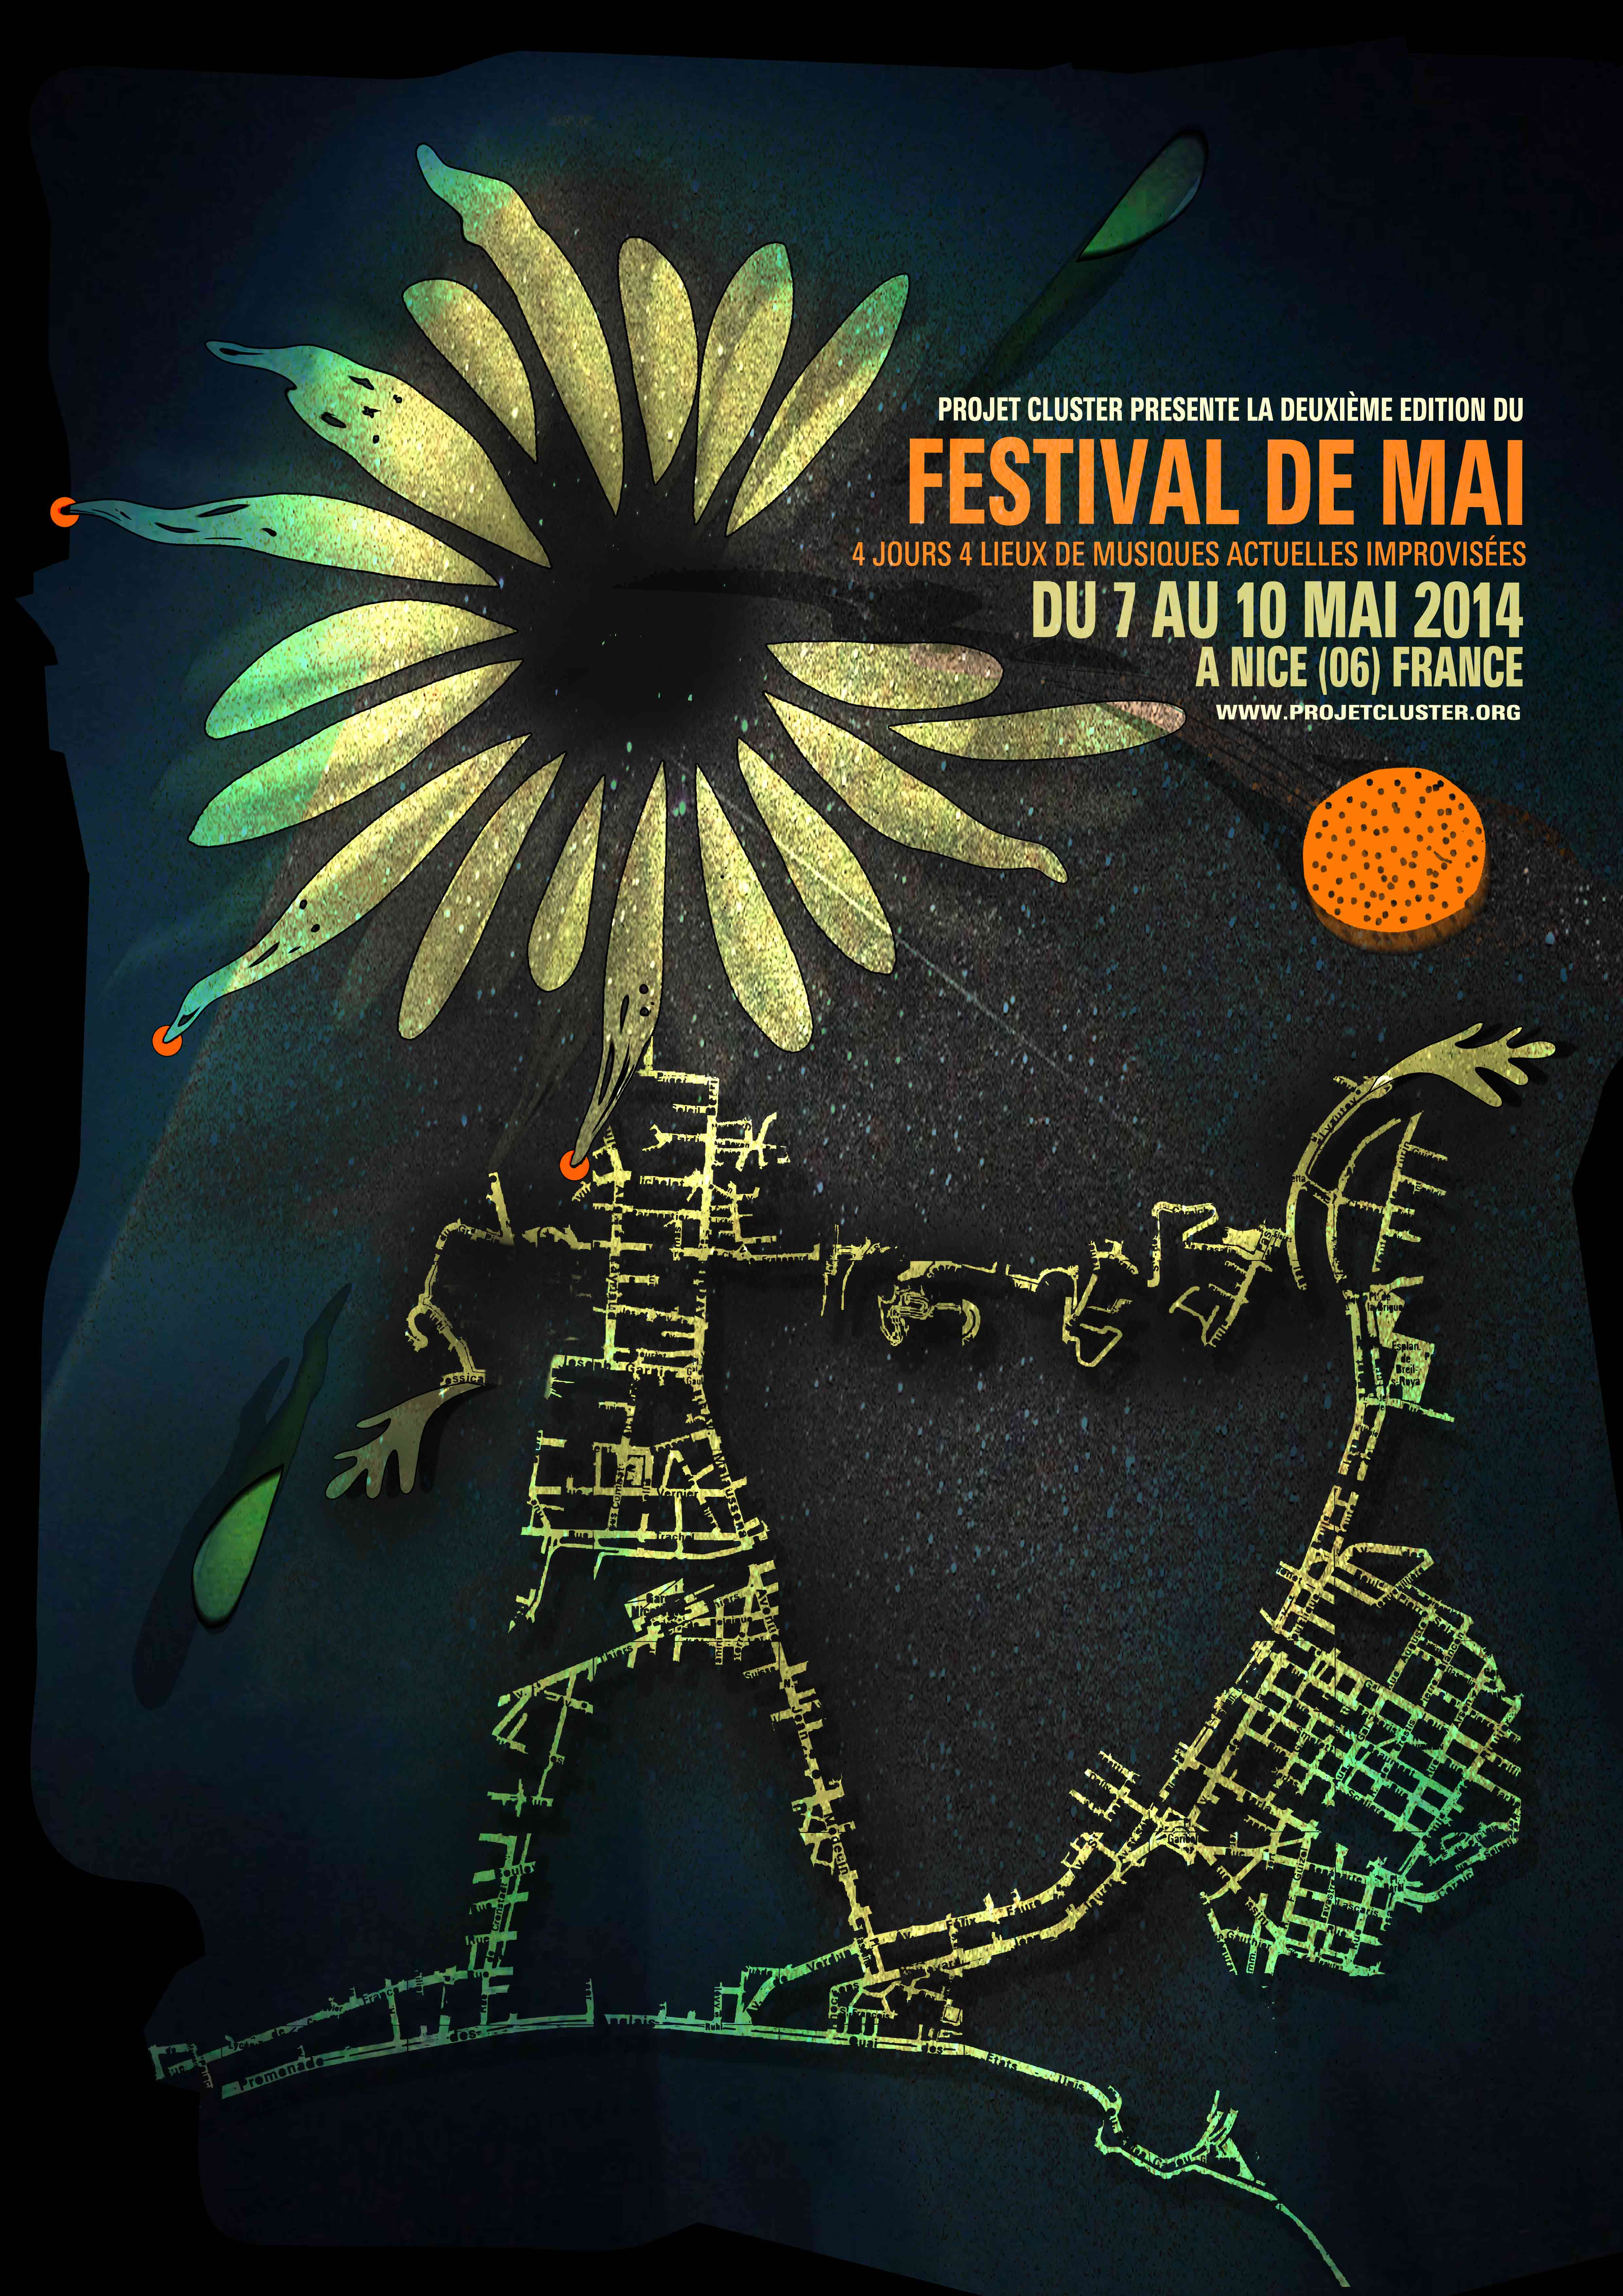 Festmai2014-AfficheA2-Noir-RVB-02-web